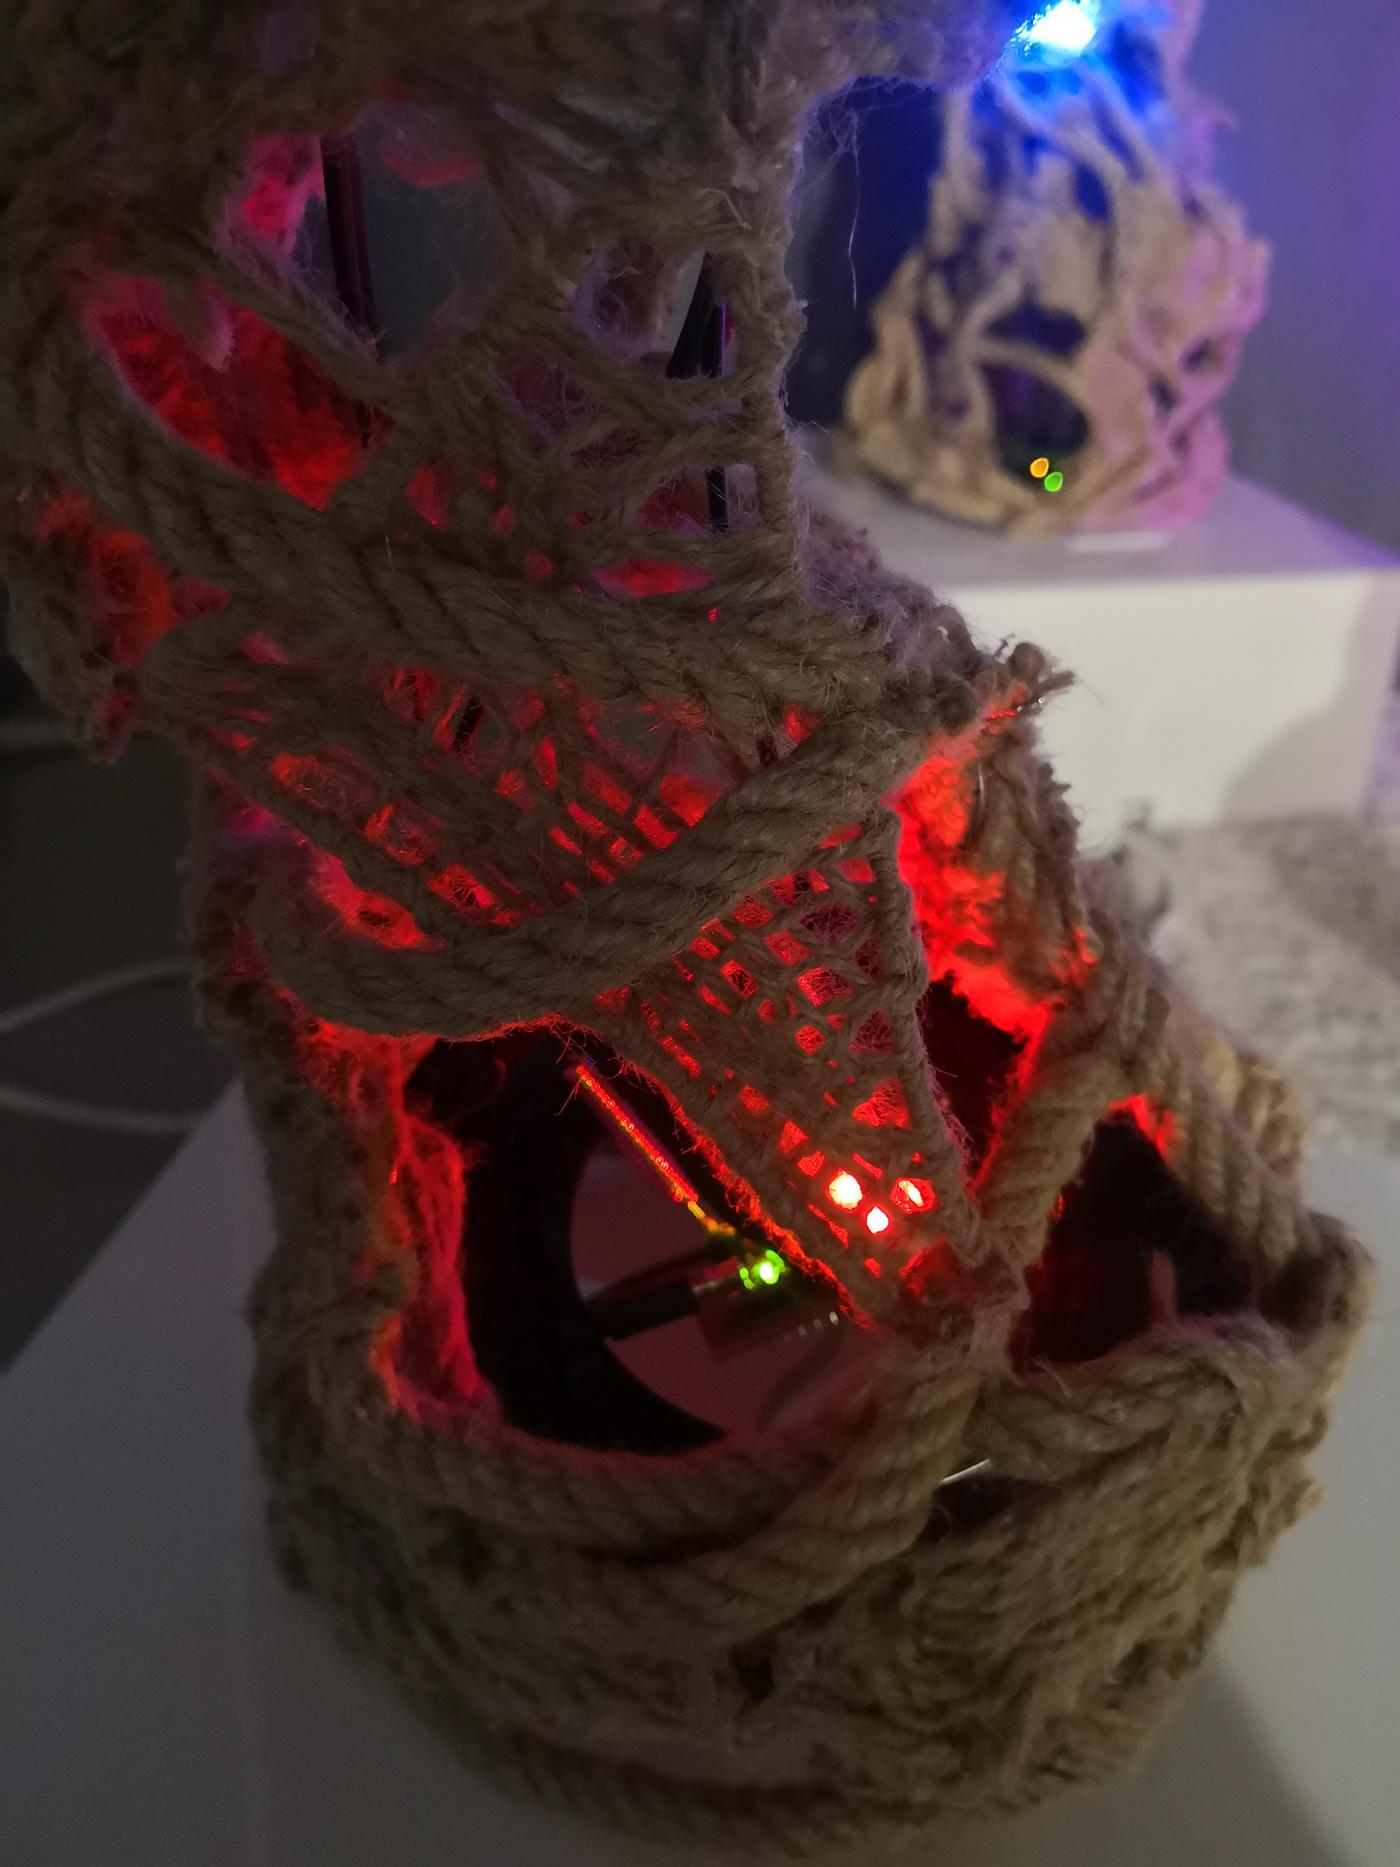 community lights interactive art textile rope Arduino Sensors